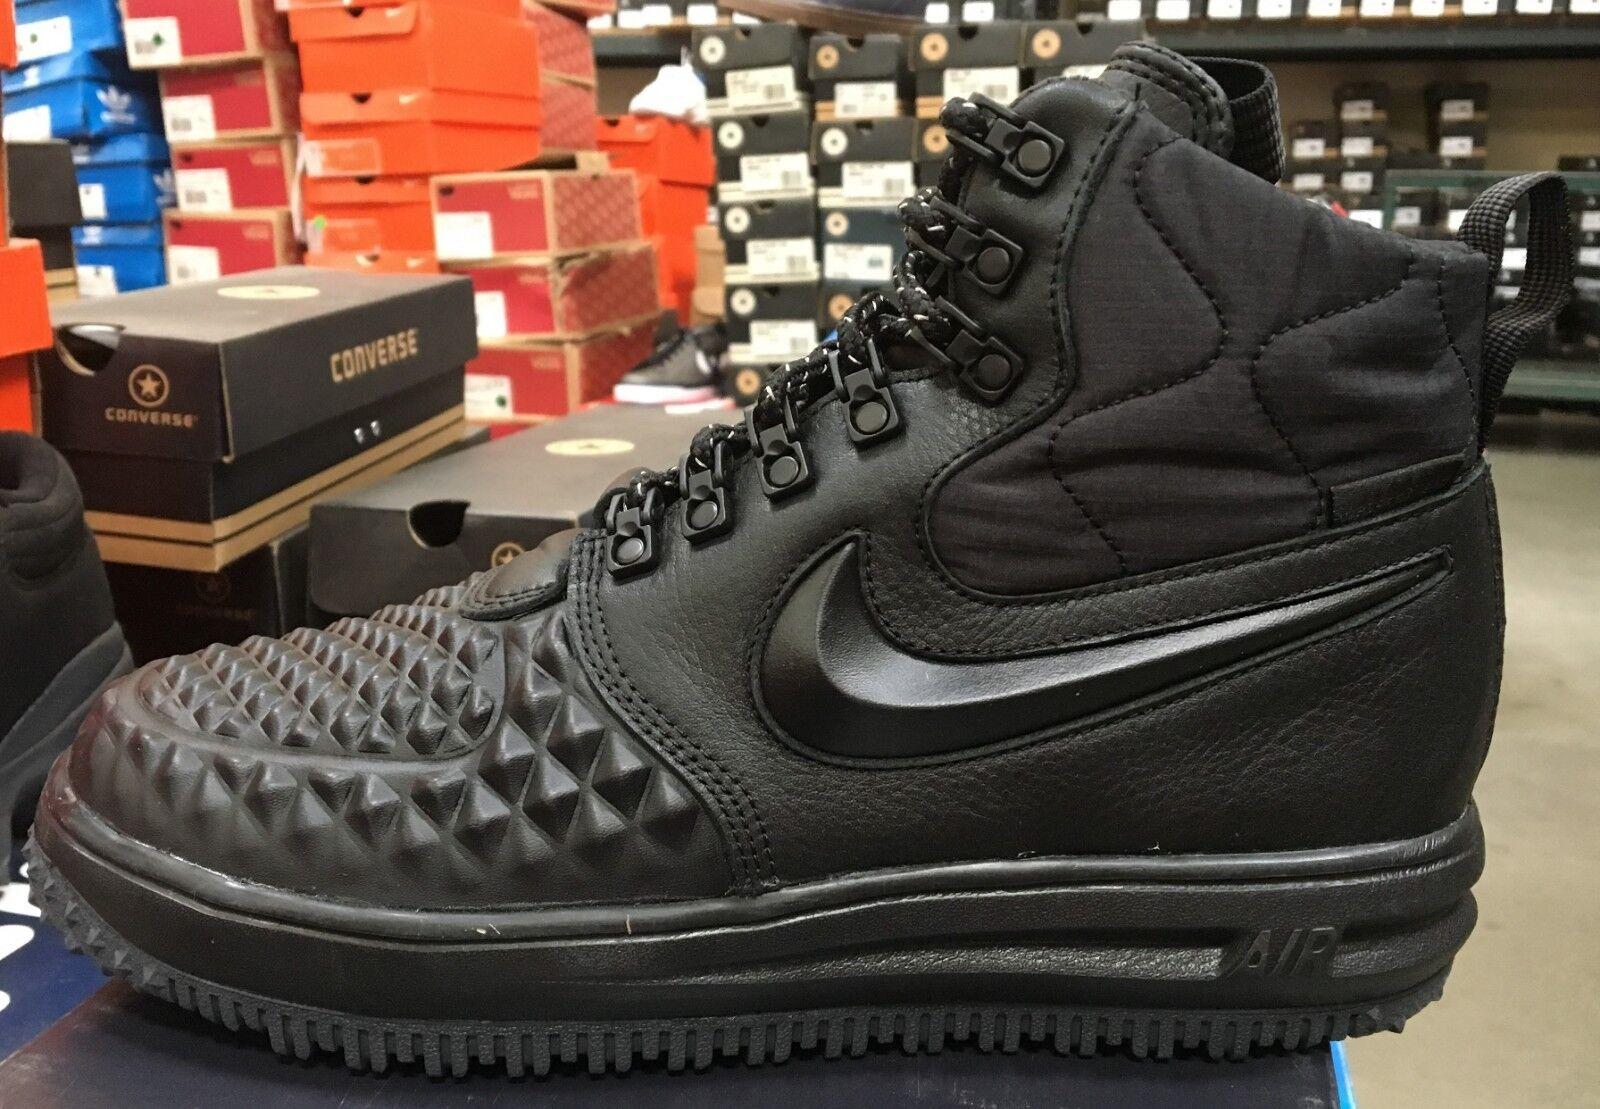 Nike Air Lunar Force LF1 Duckboot 17 Men's Basketball Boots Black  916682 002  K